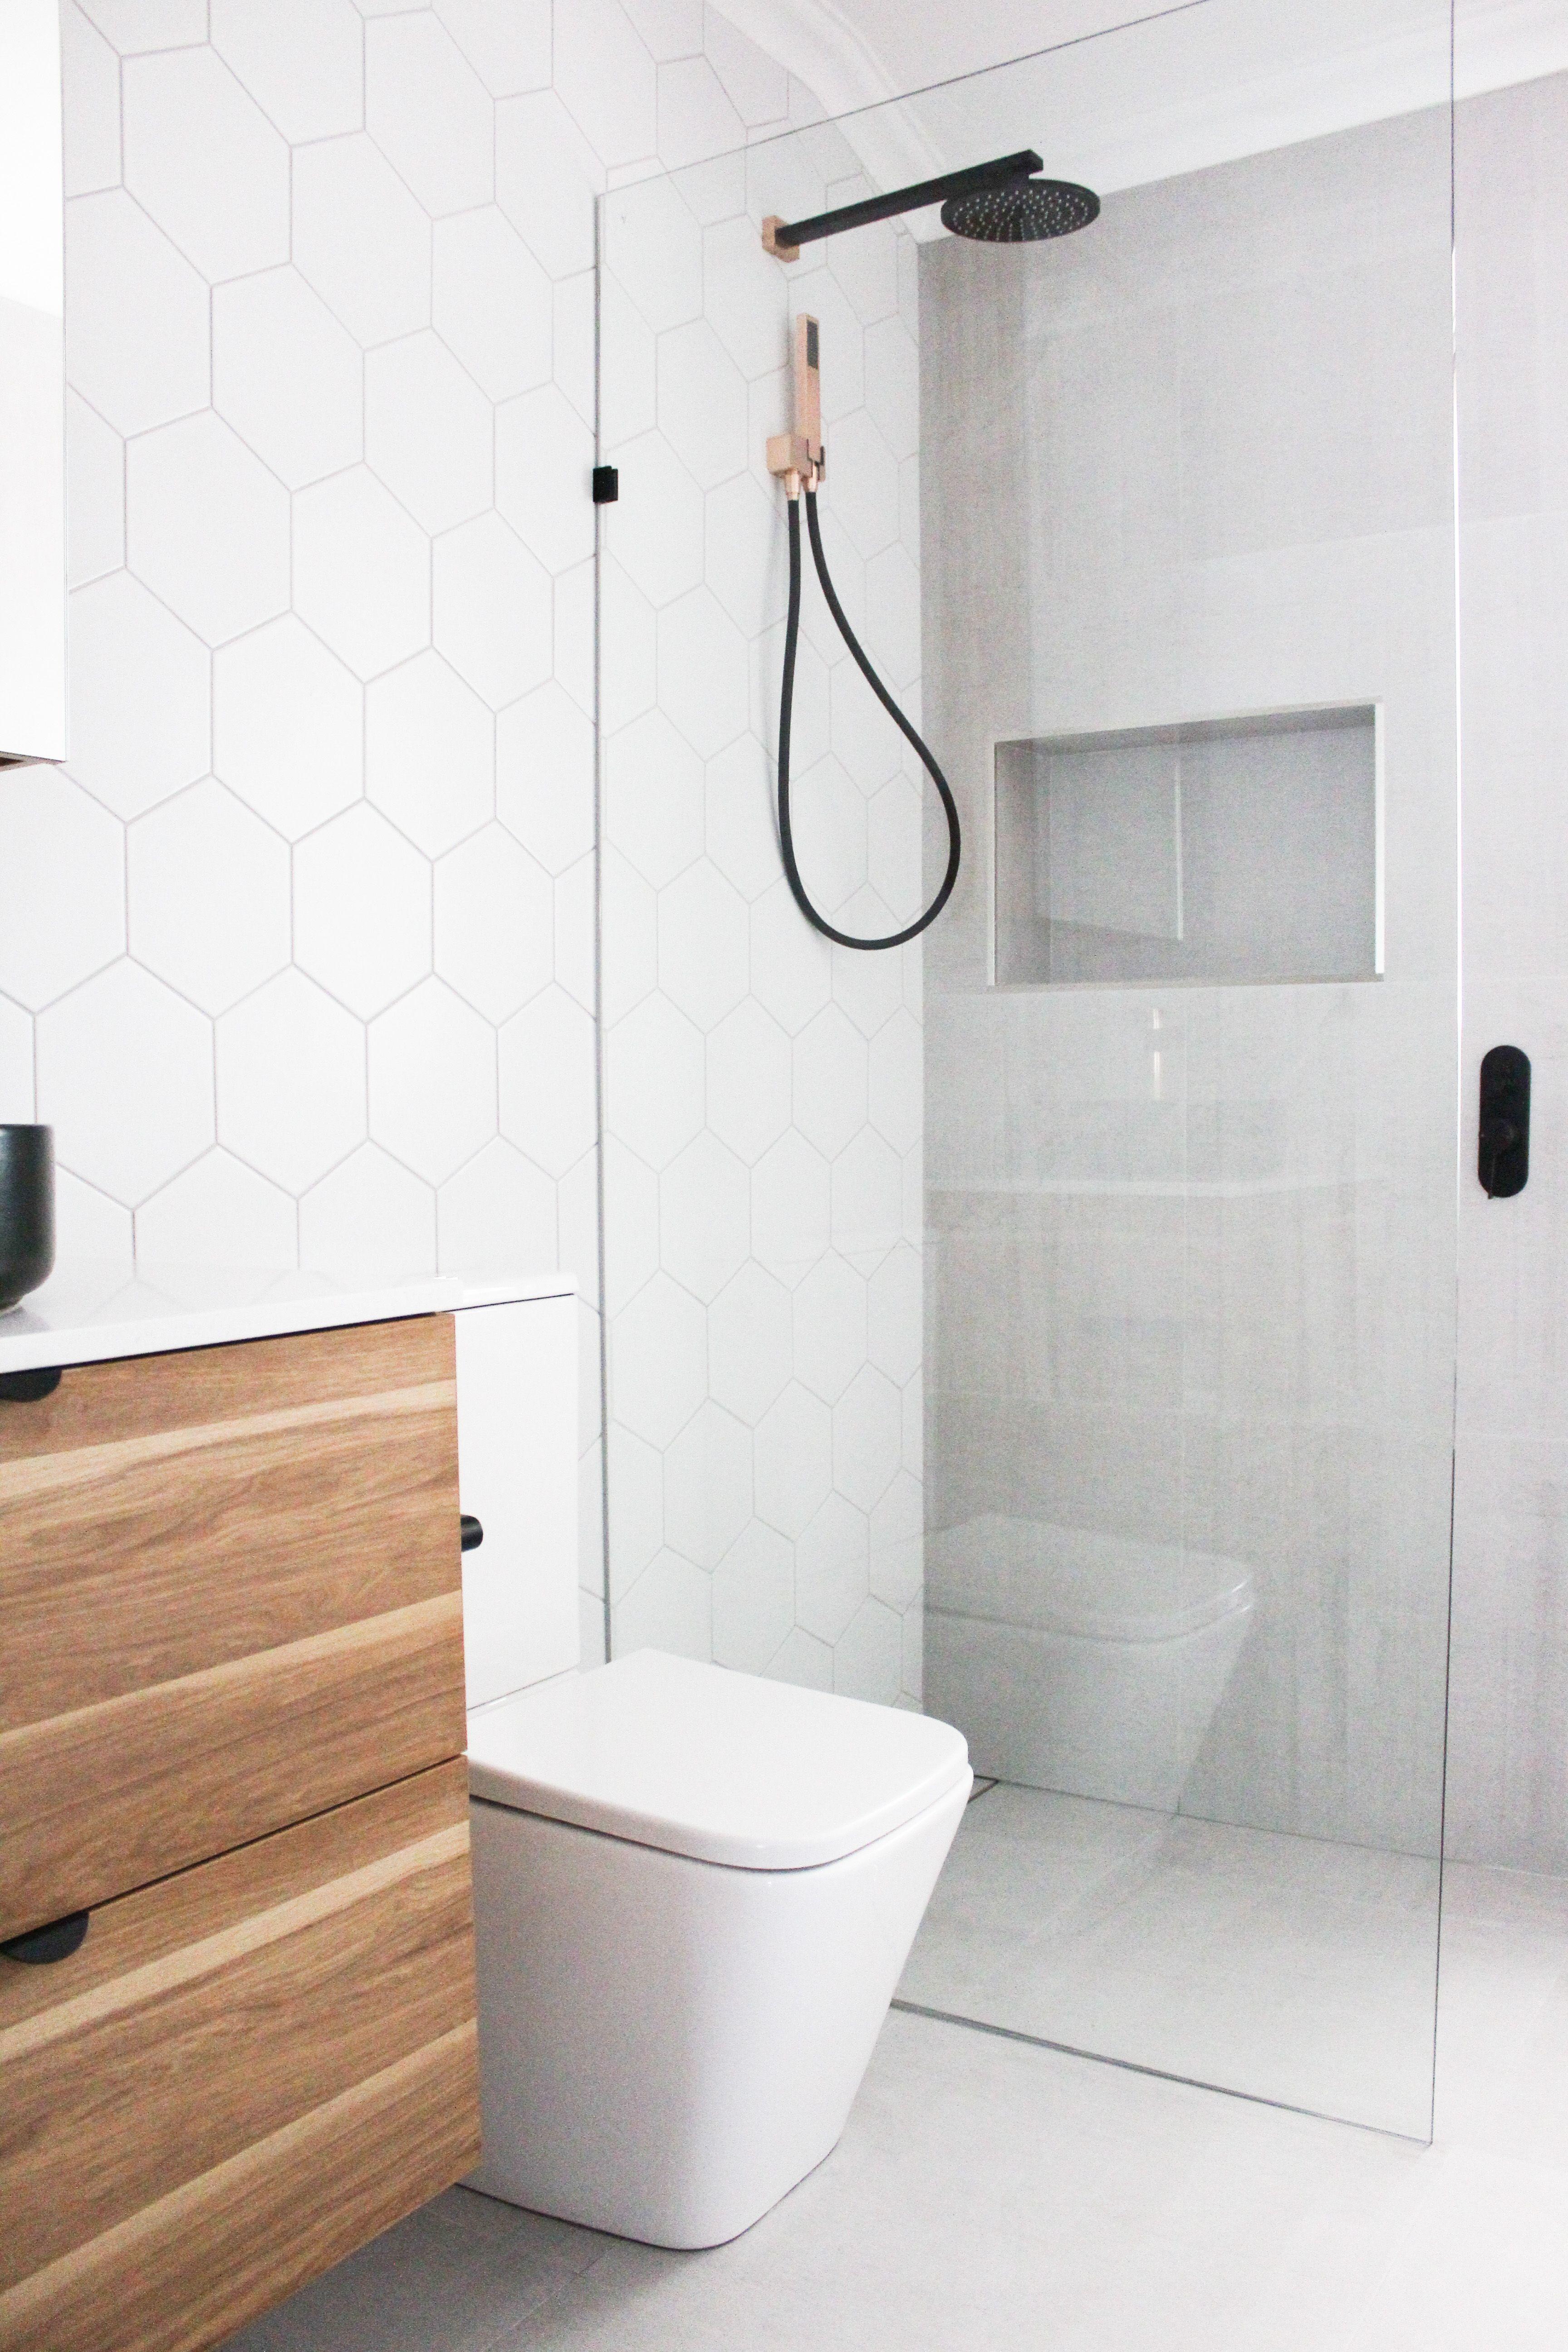 Hexagon Bathroom Tiles Bathroom Renovations Perth Walk In Shower Bathroom Renovation Trends